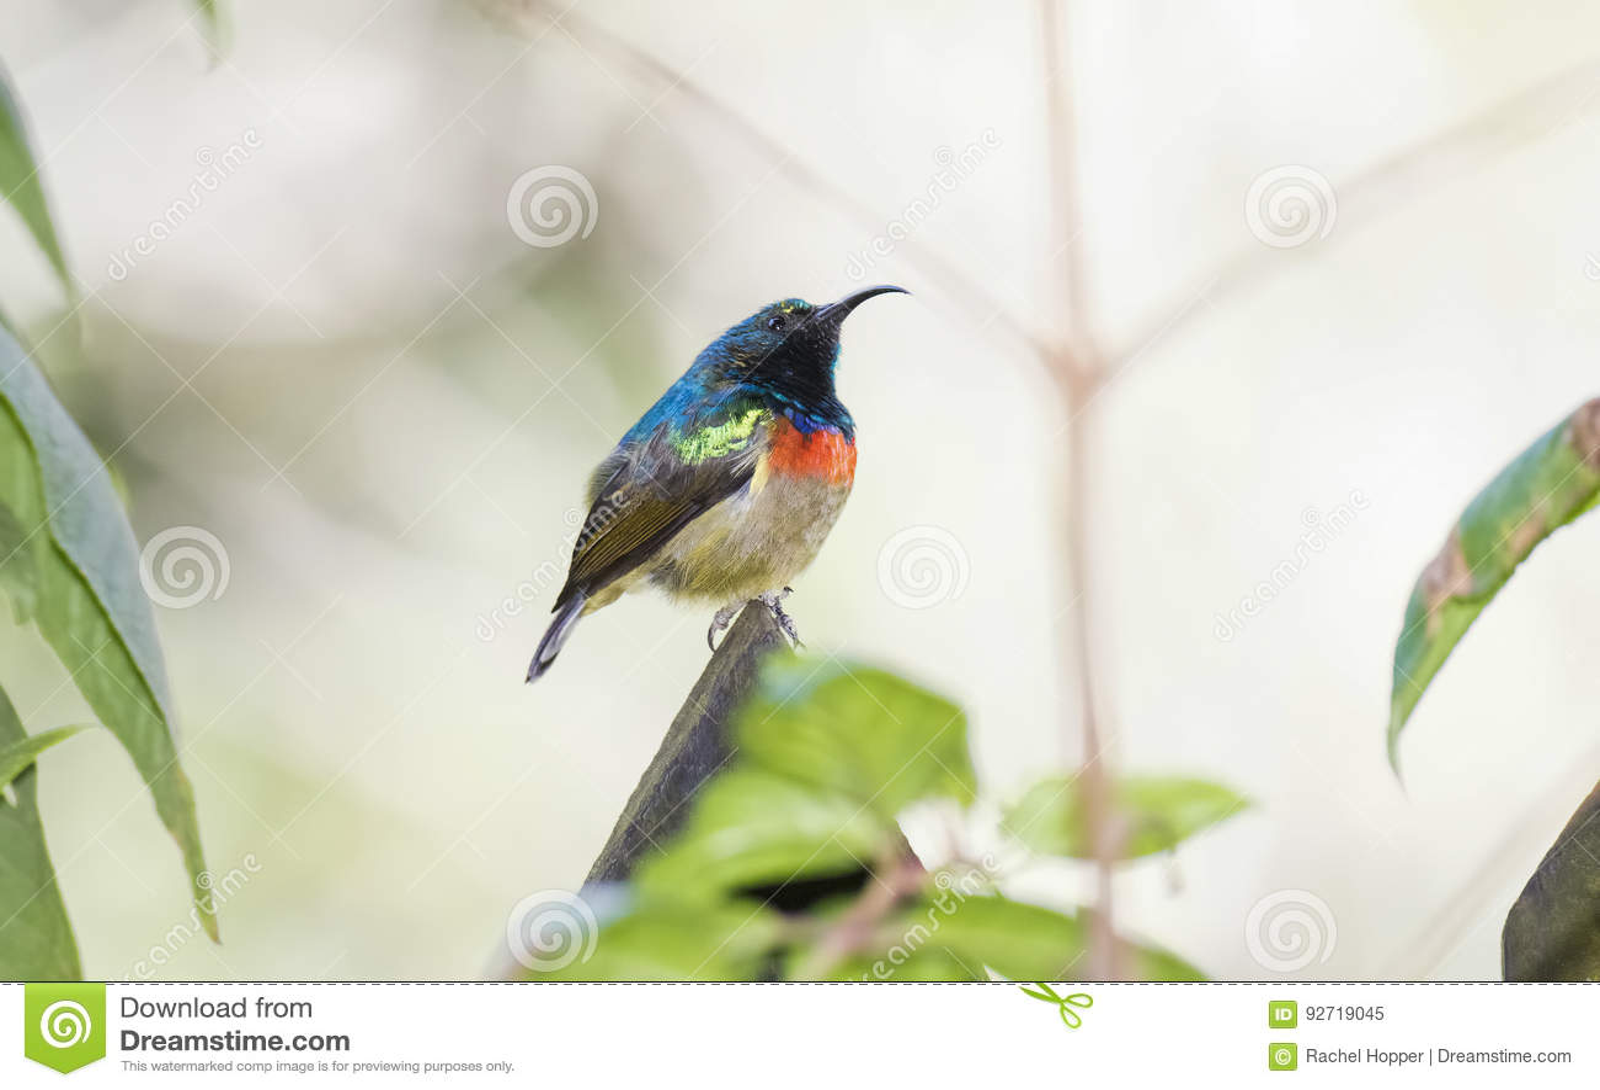 The Rare, Threatened, & Endemic Male Usambara Double-collared Sunbird